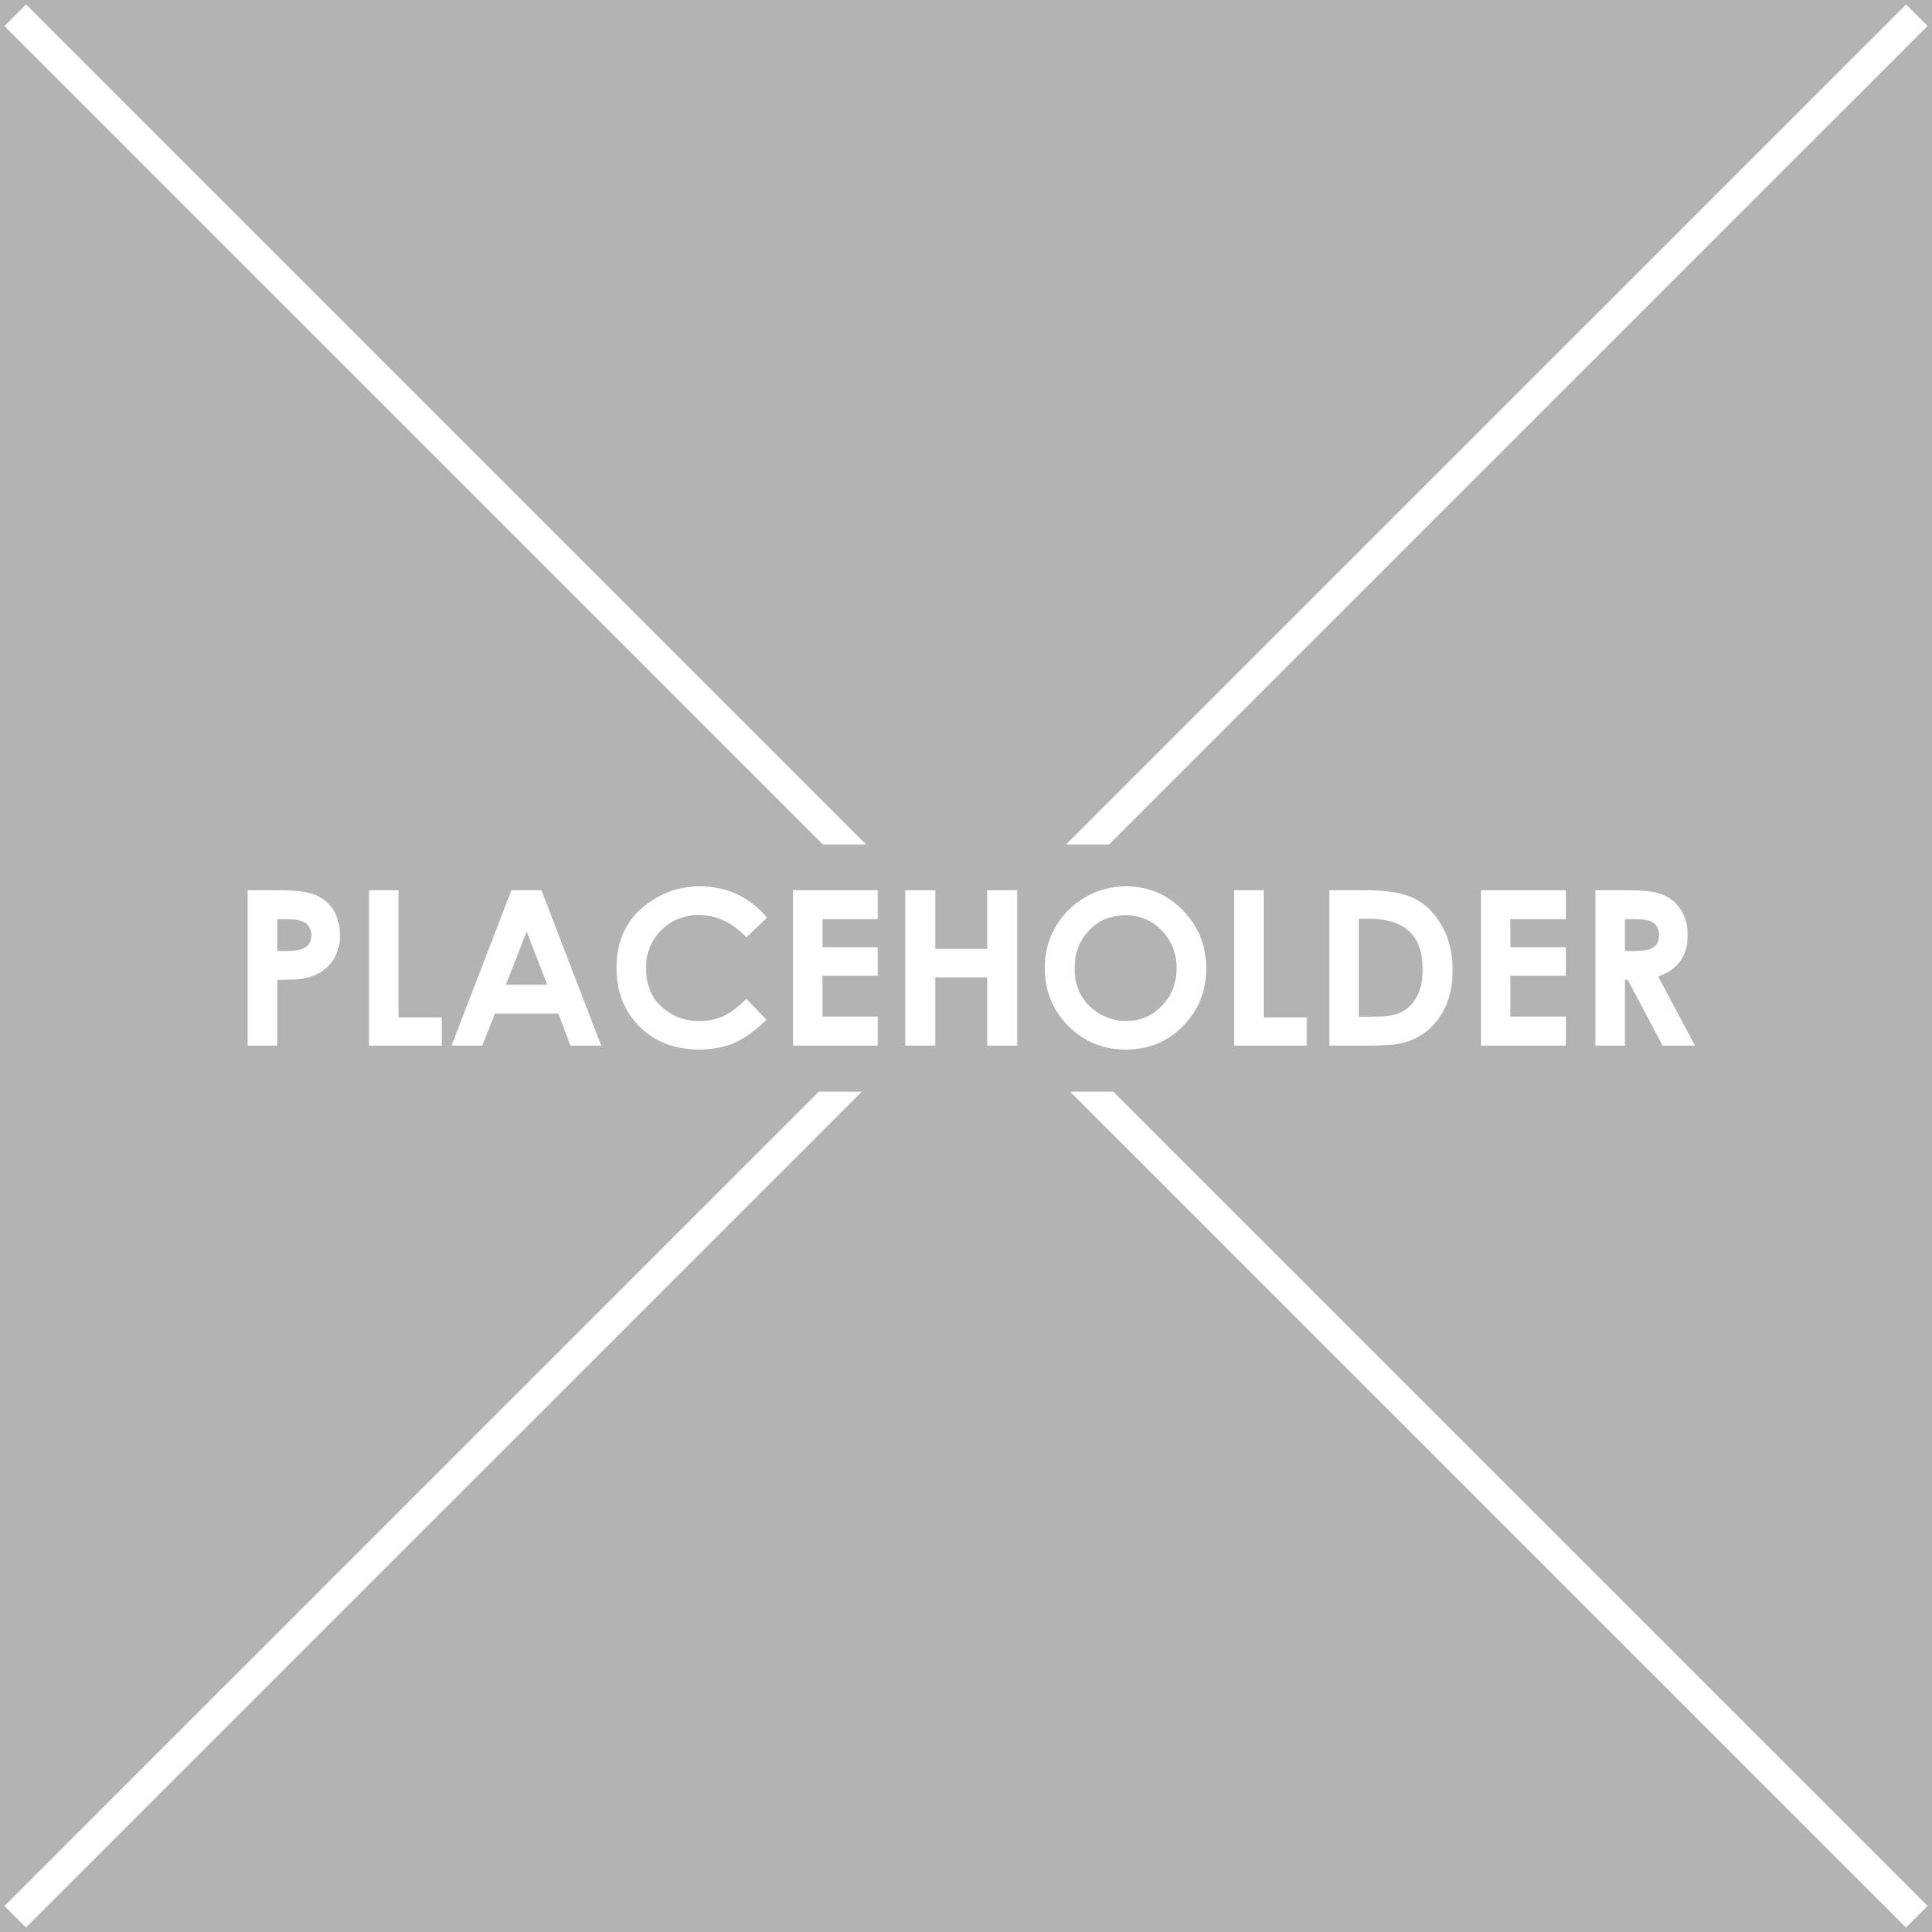 Placeholder copy 3.png